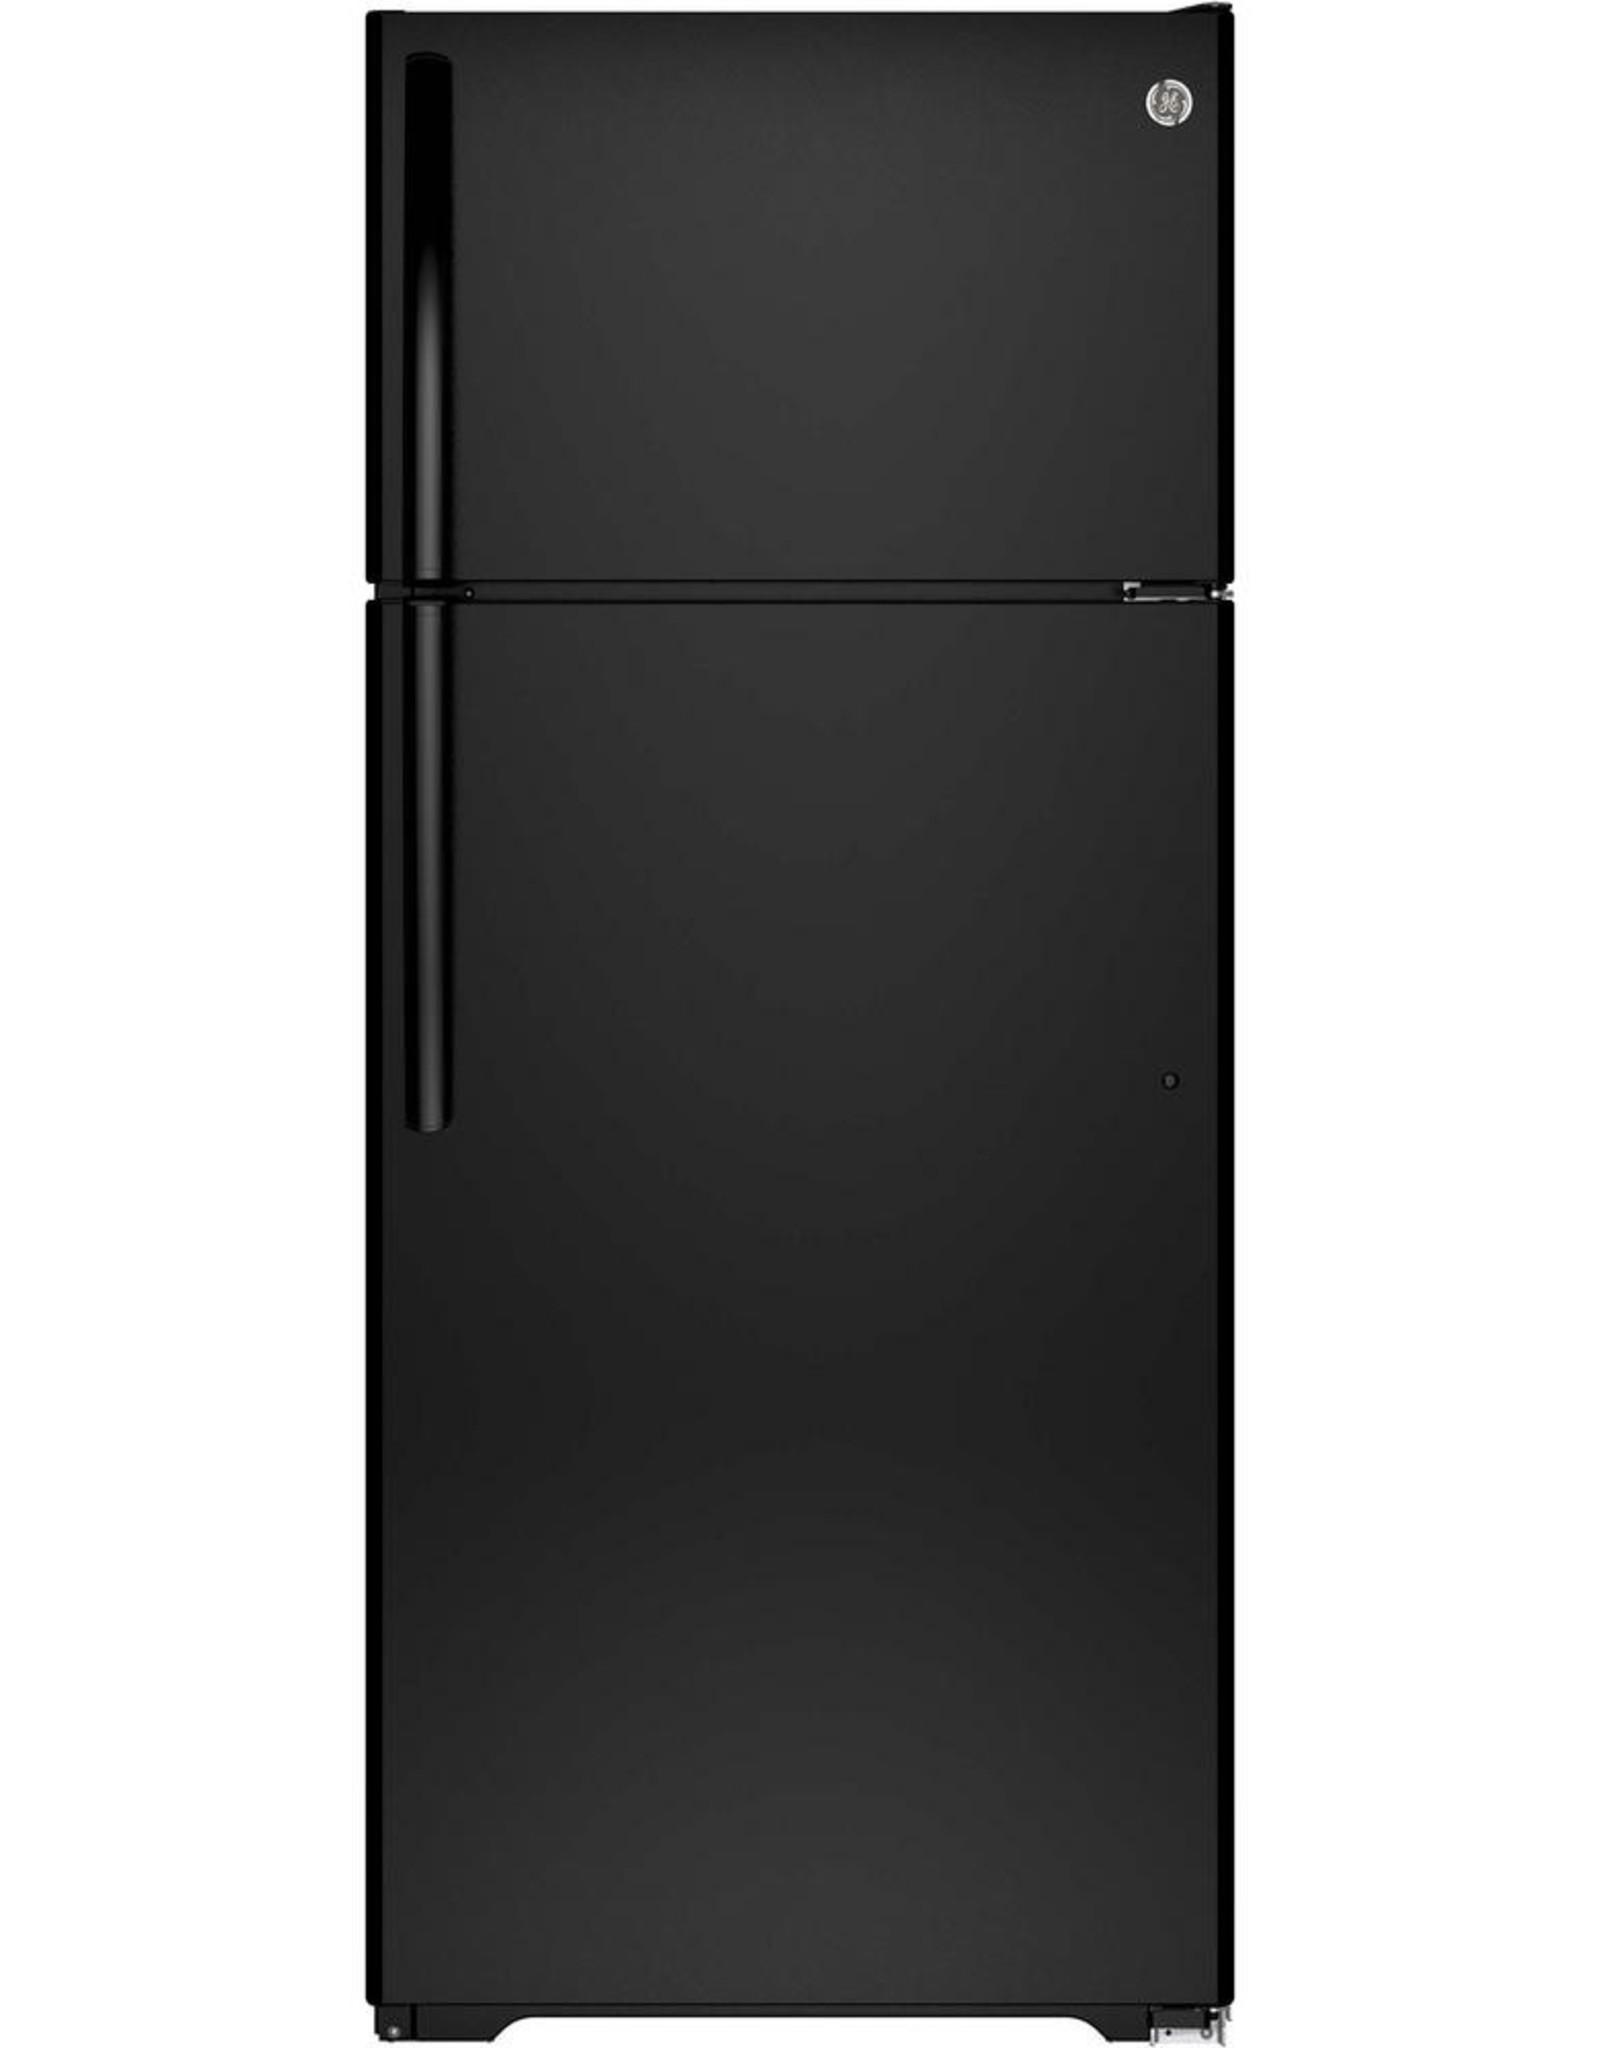 W&B Black GE Refrigerator